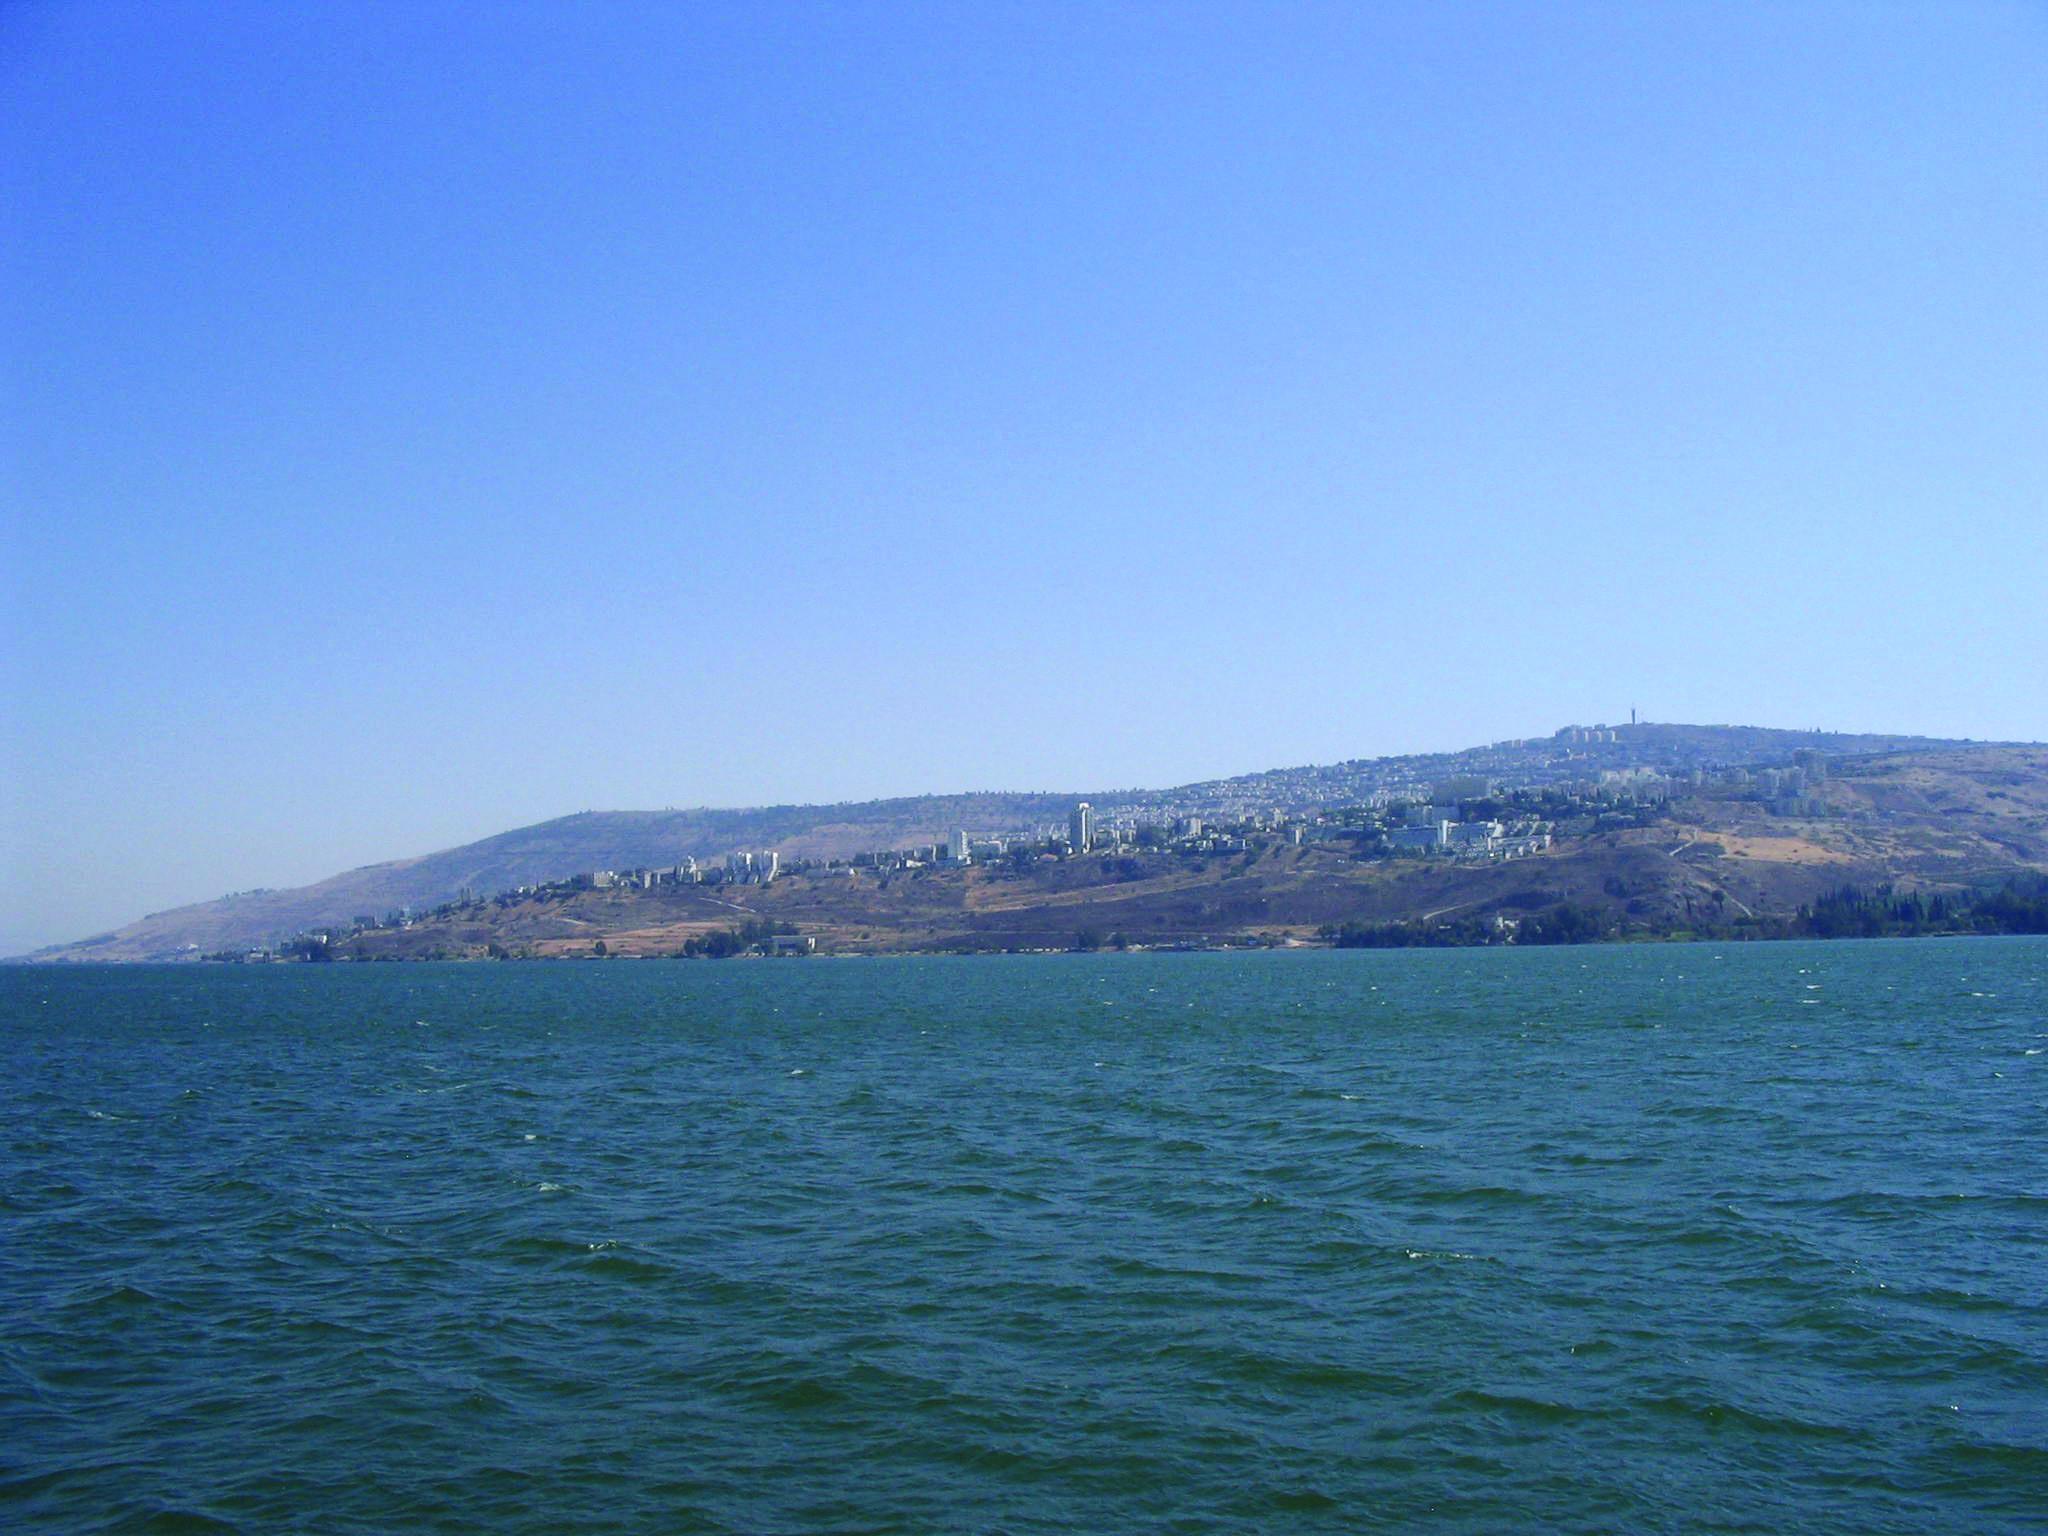 Sea Of Galilee And City Of Tiberias